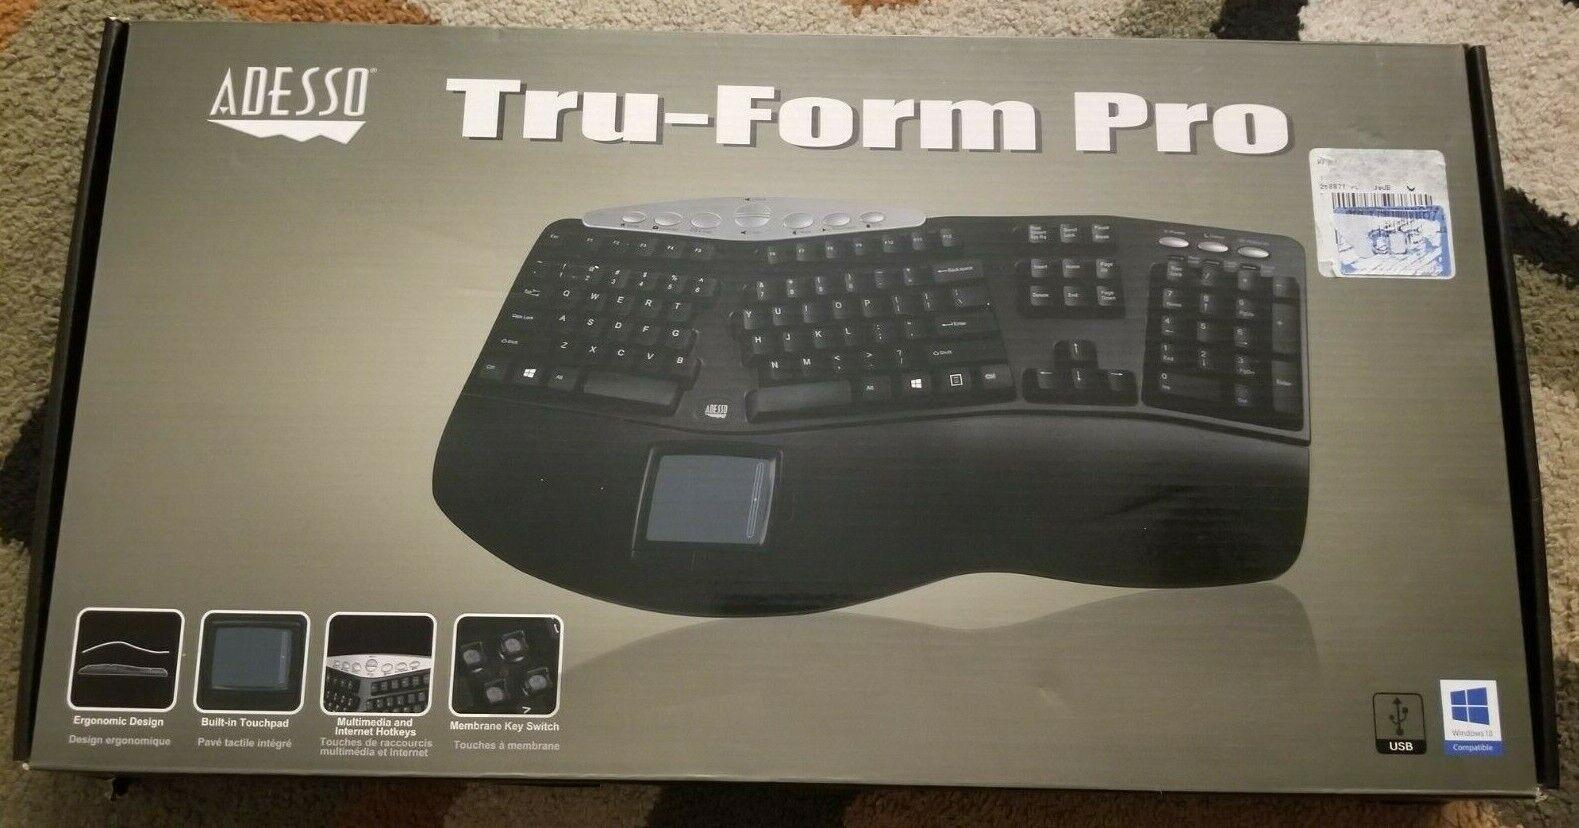 Adesso PCK-308UB - Tru-Form Pro Ergonomic Contour TouchPad U